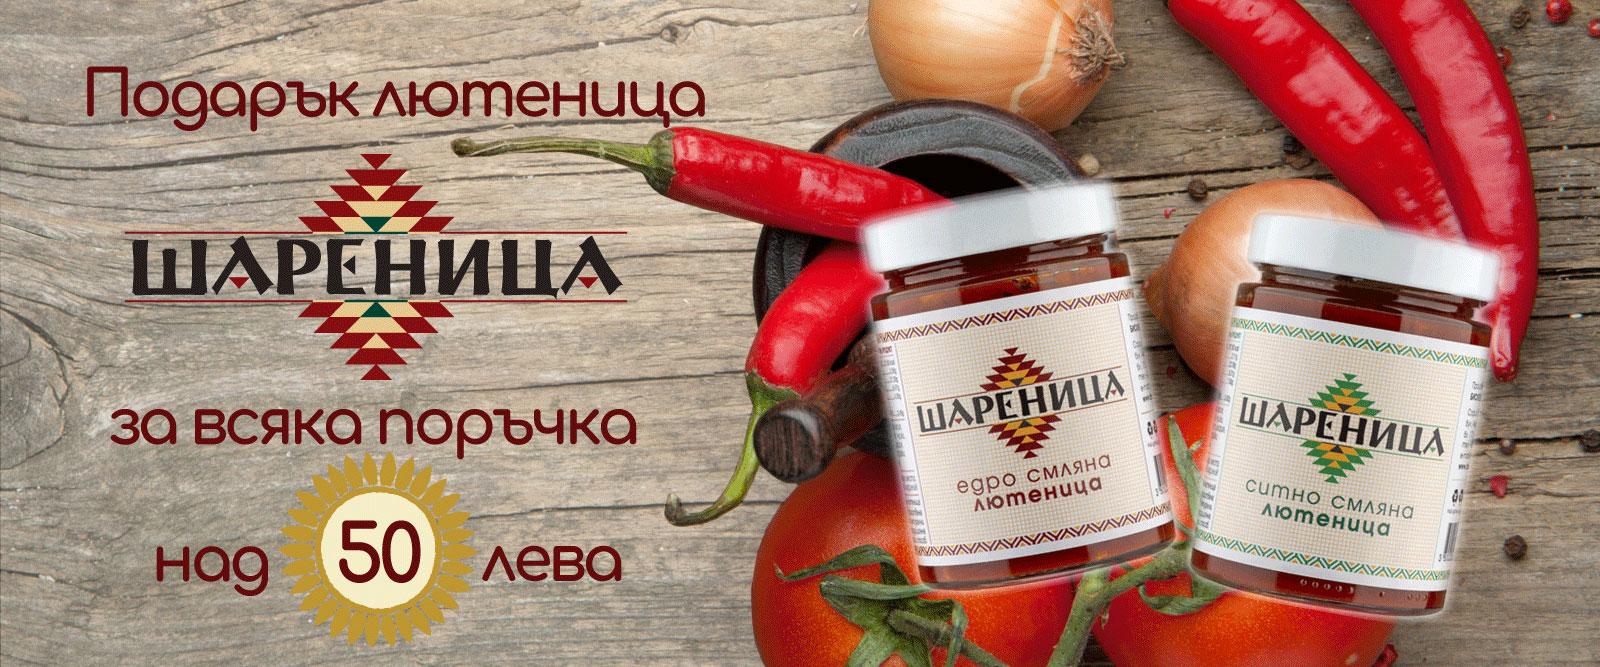 sharenitsa_promo_opti